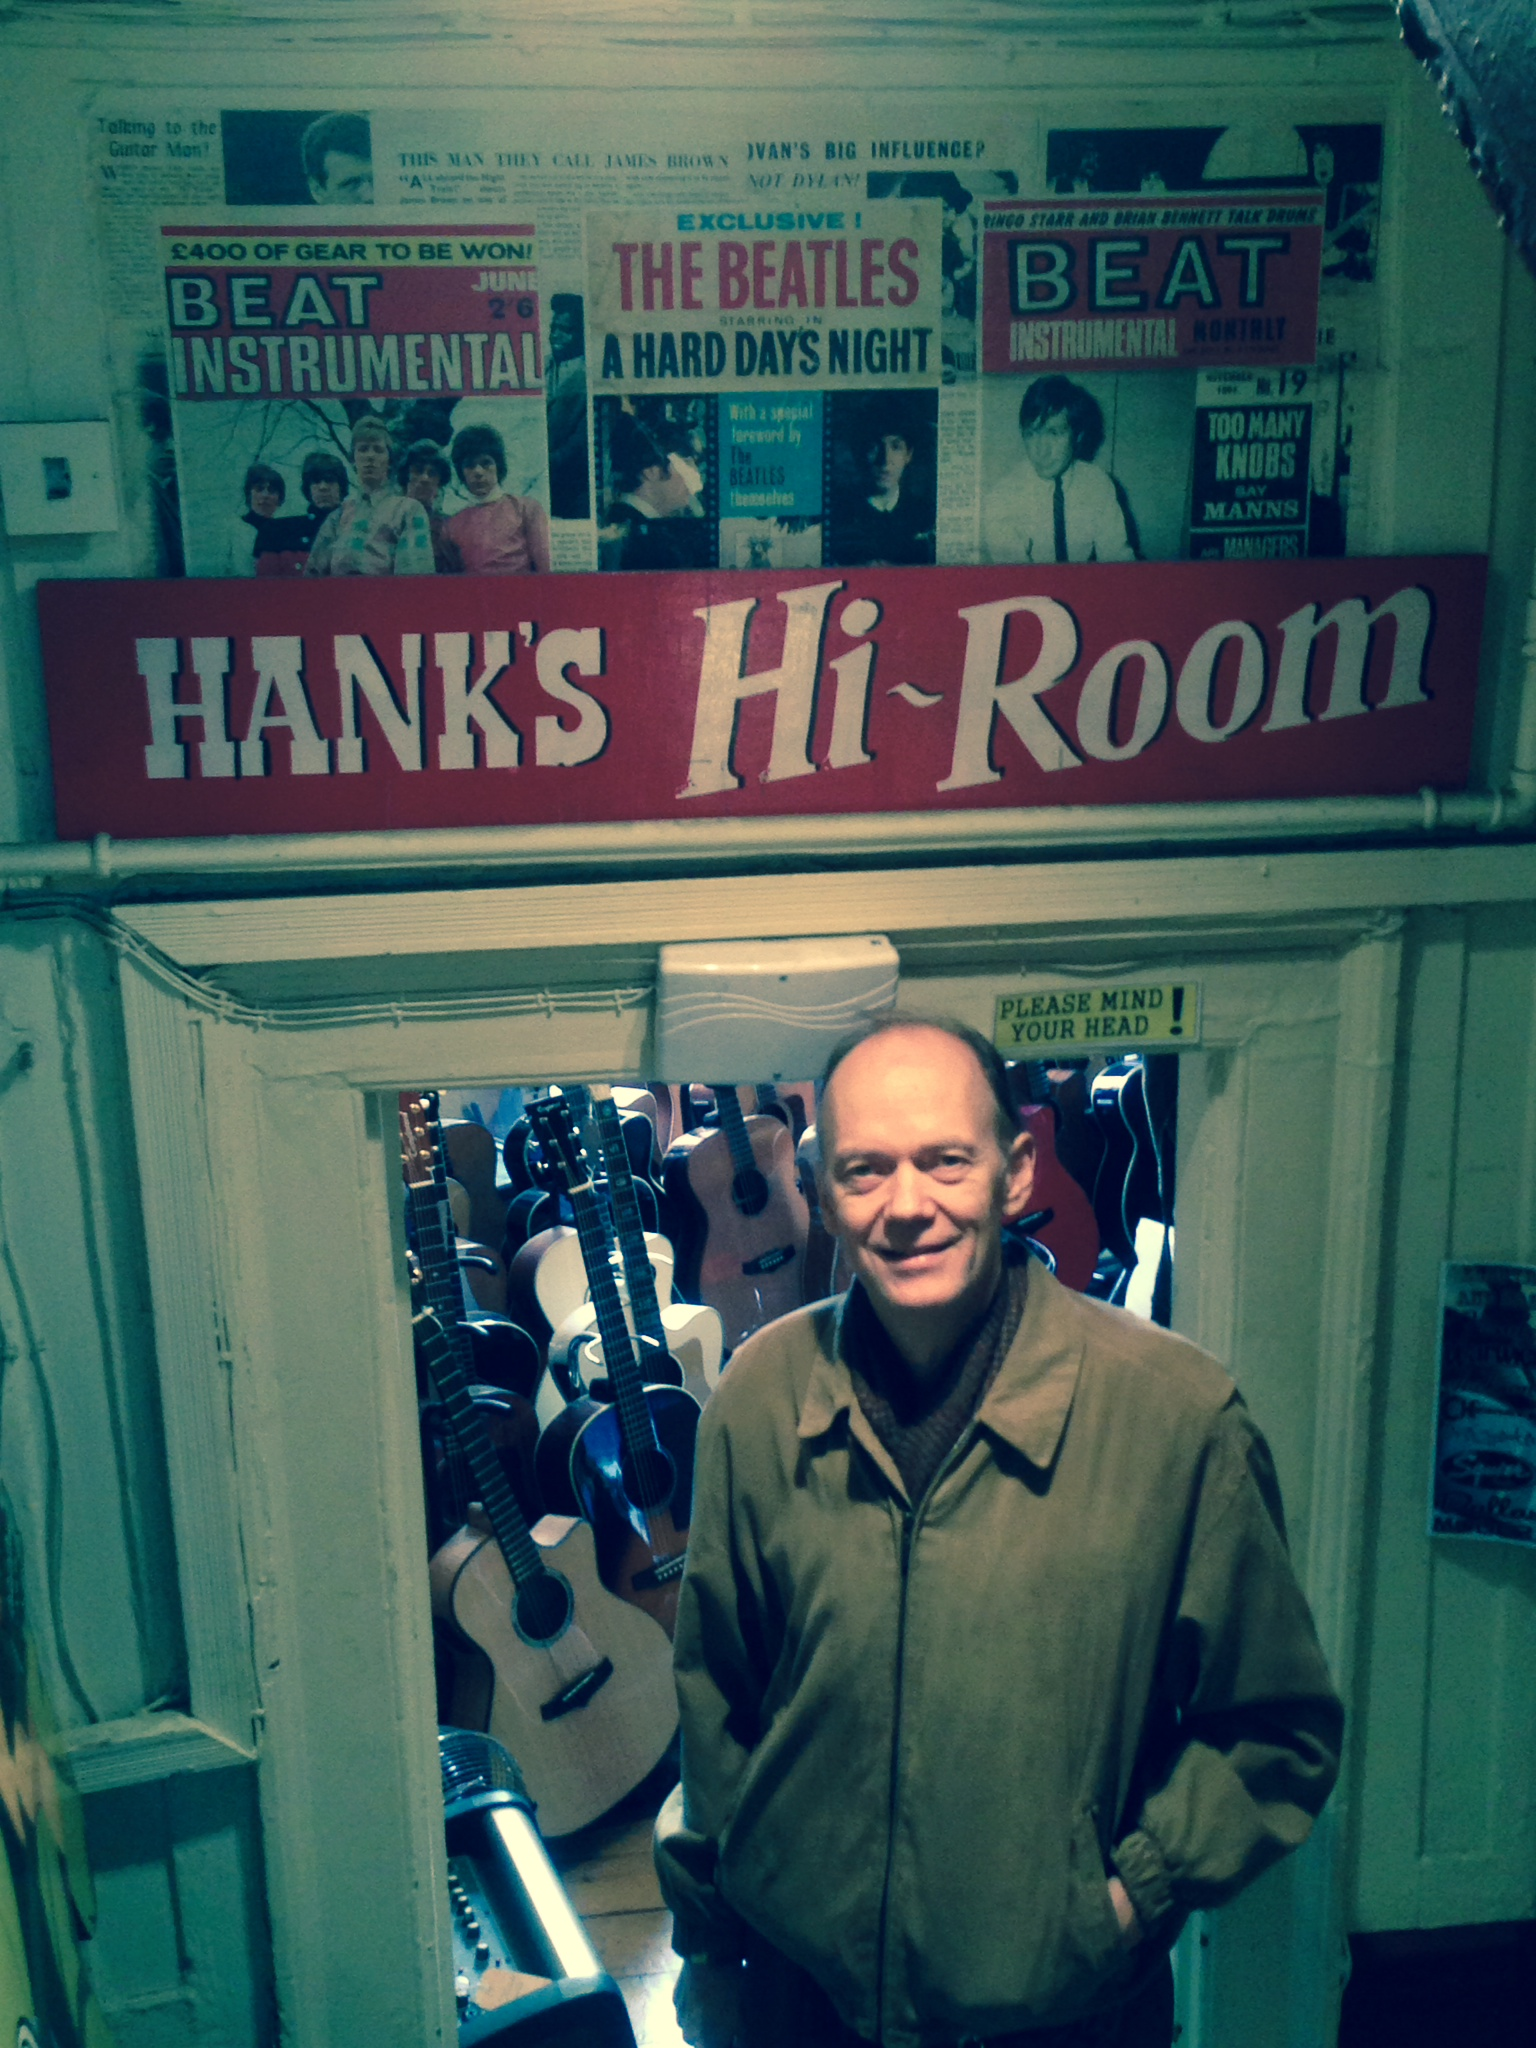 hank's hi room.JPG